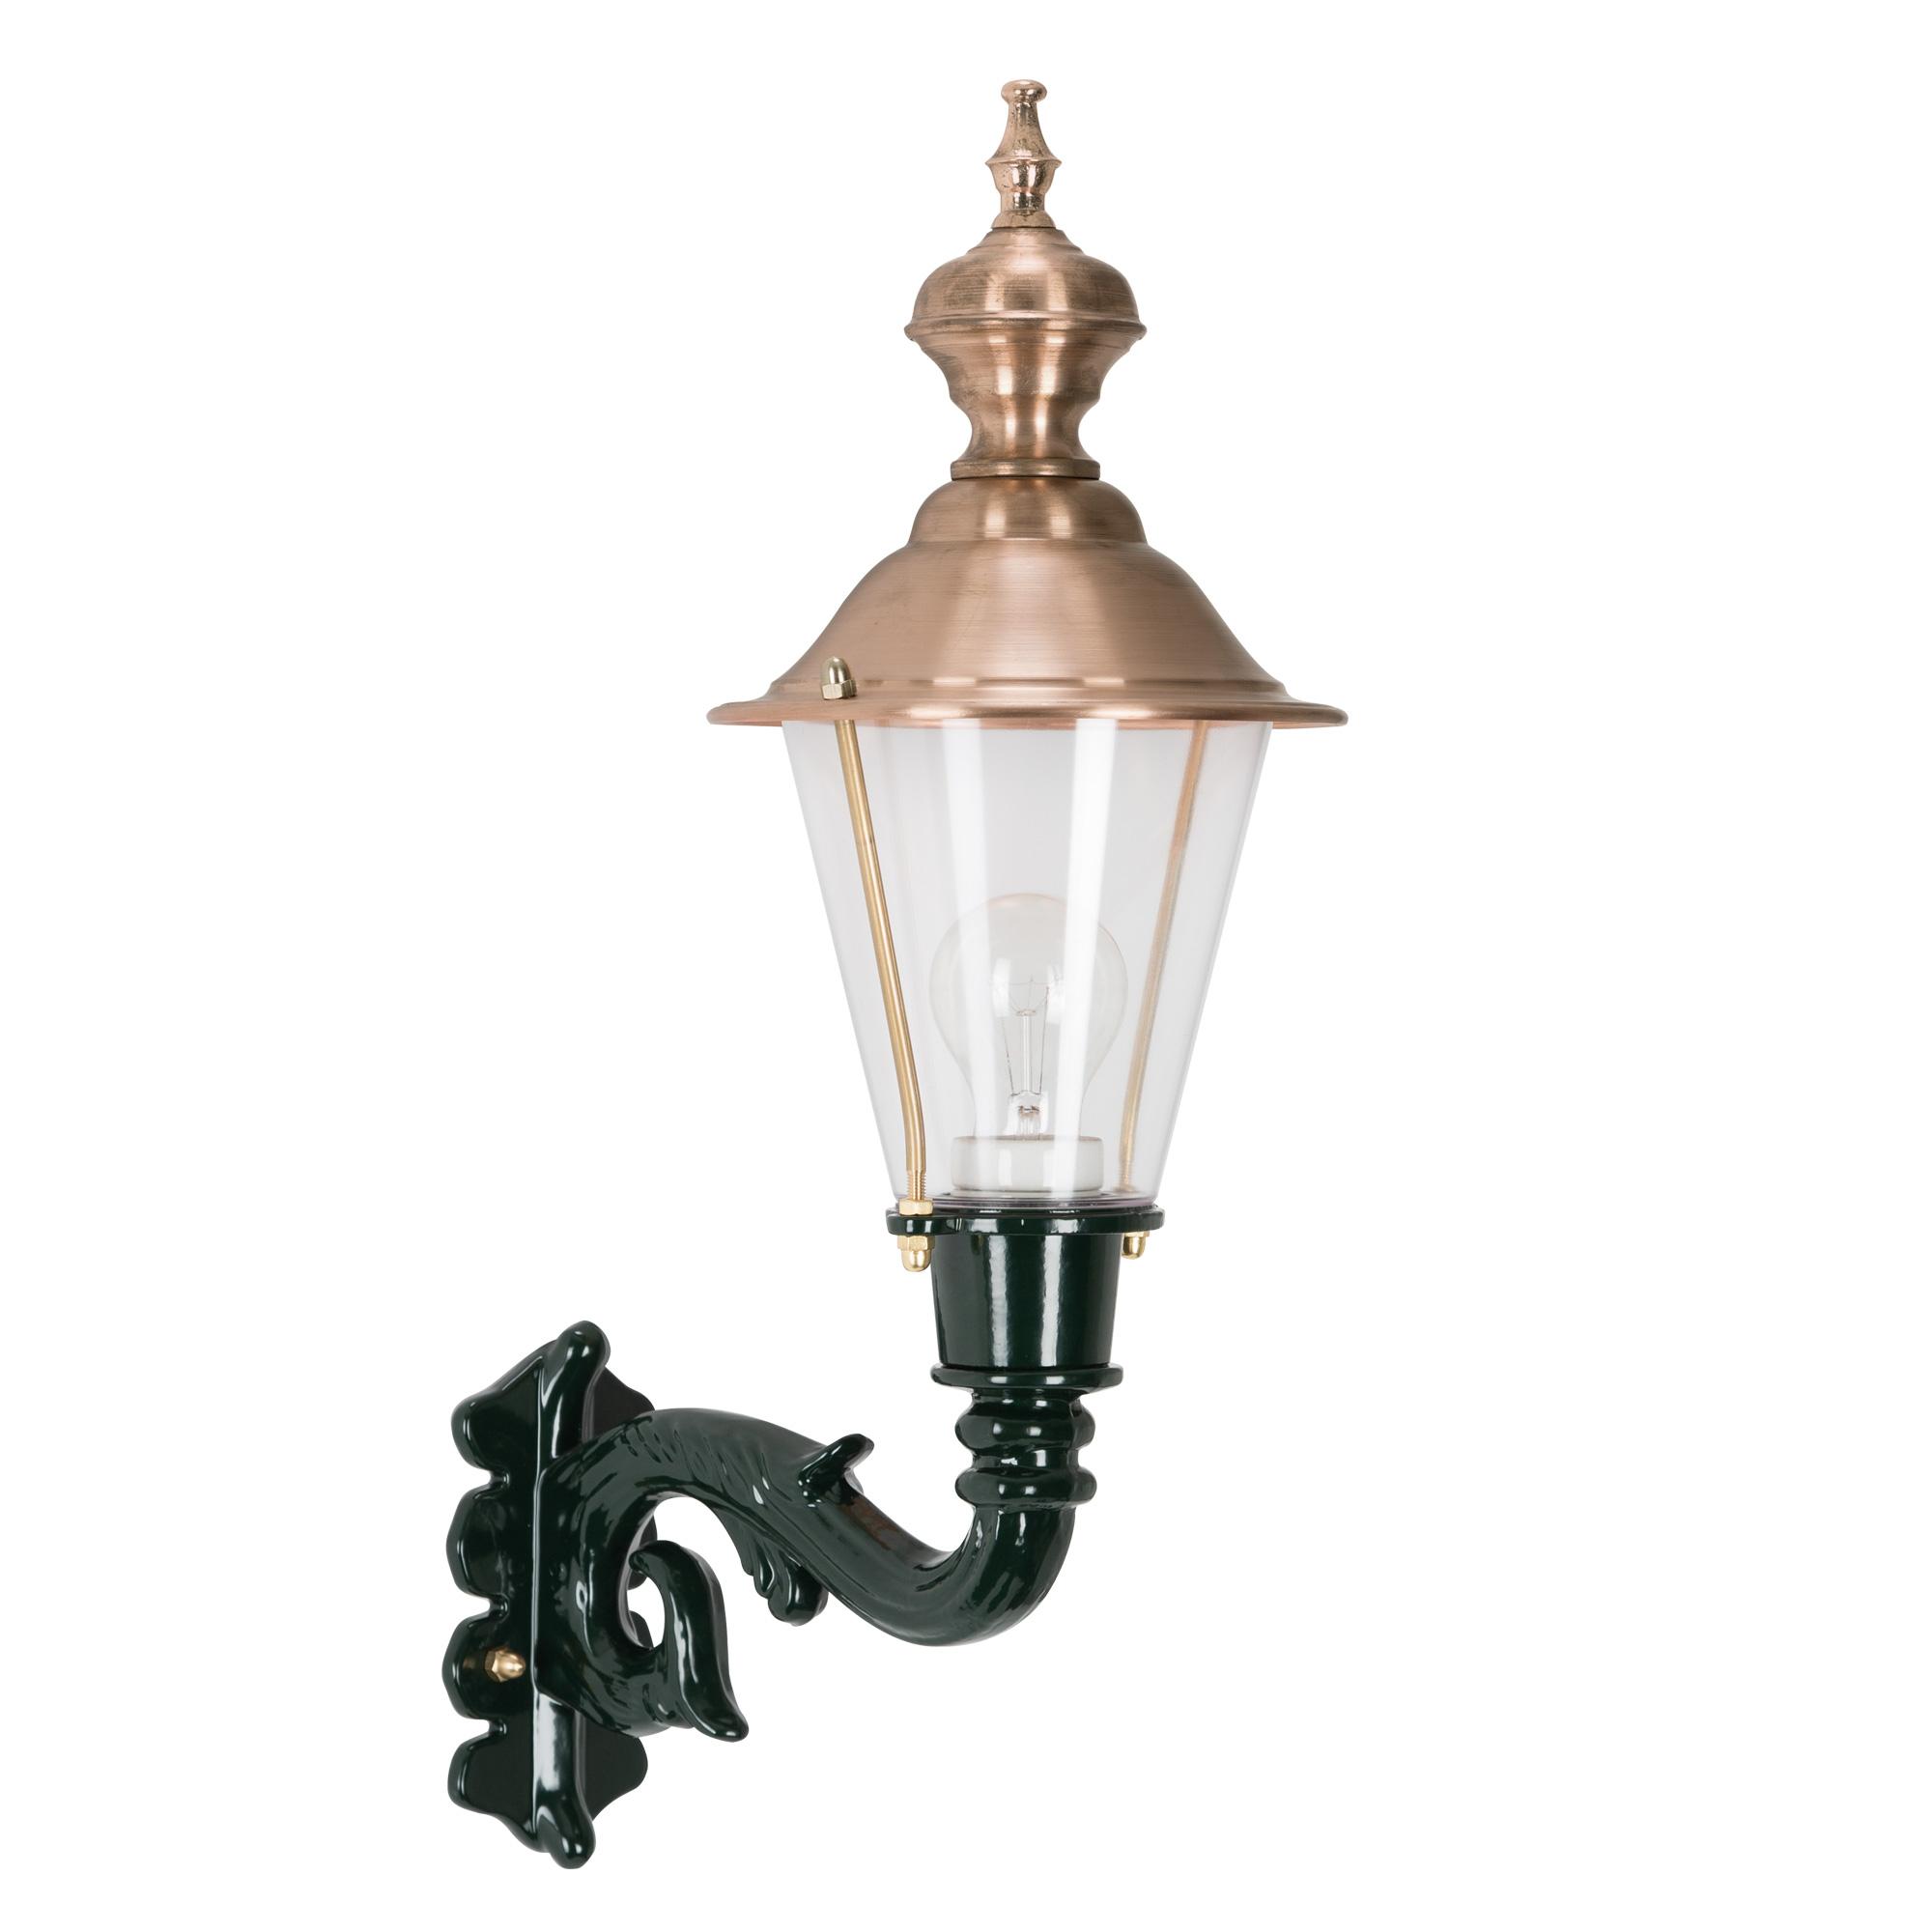 Buitenlamp Hoorn Dag Nacht Schemersensor LED